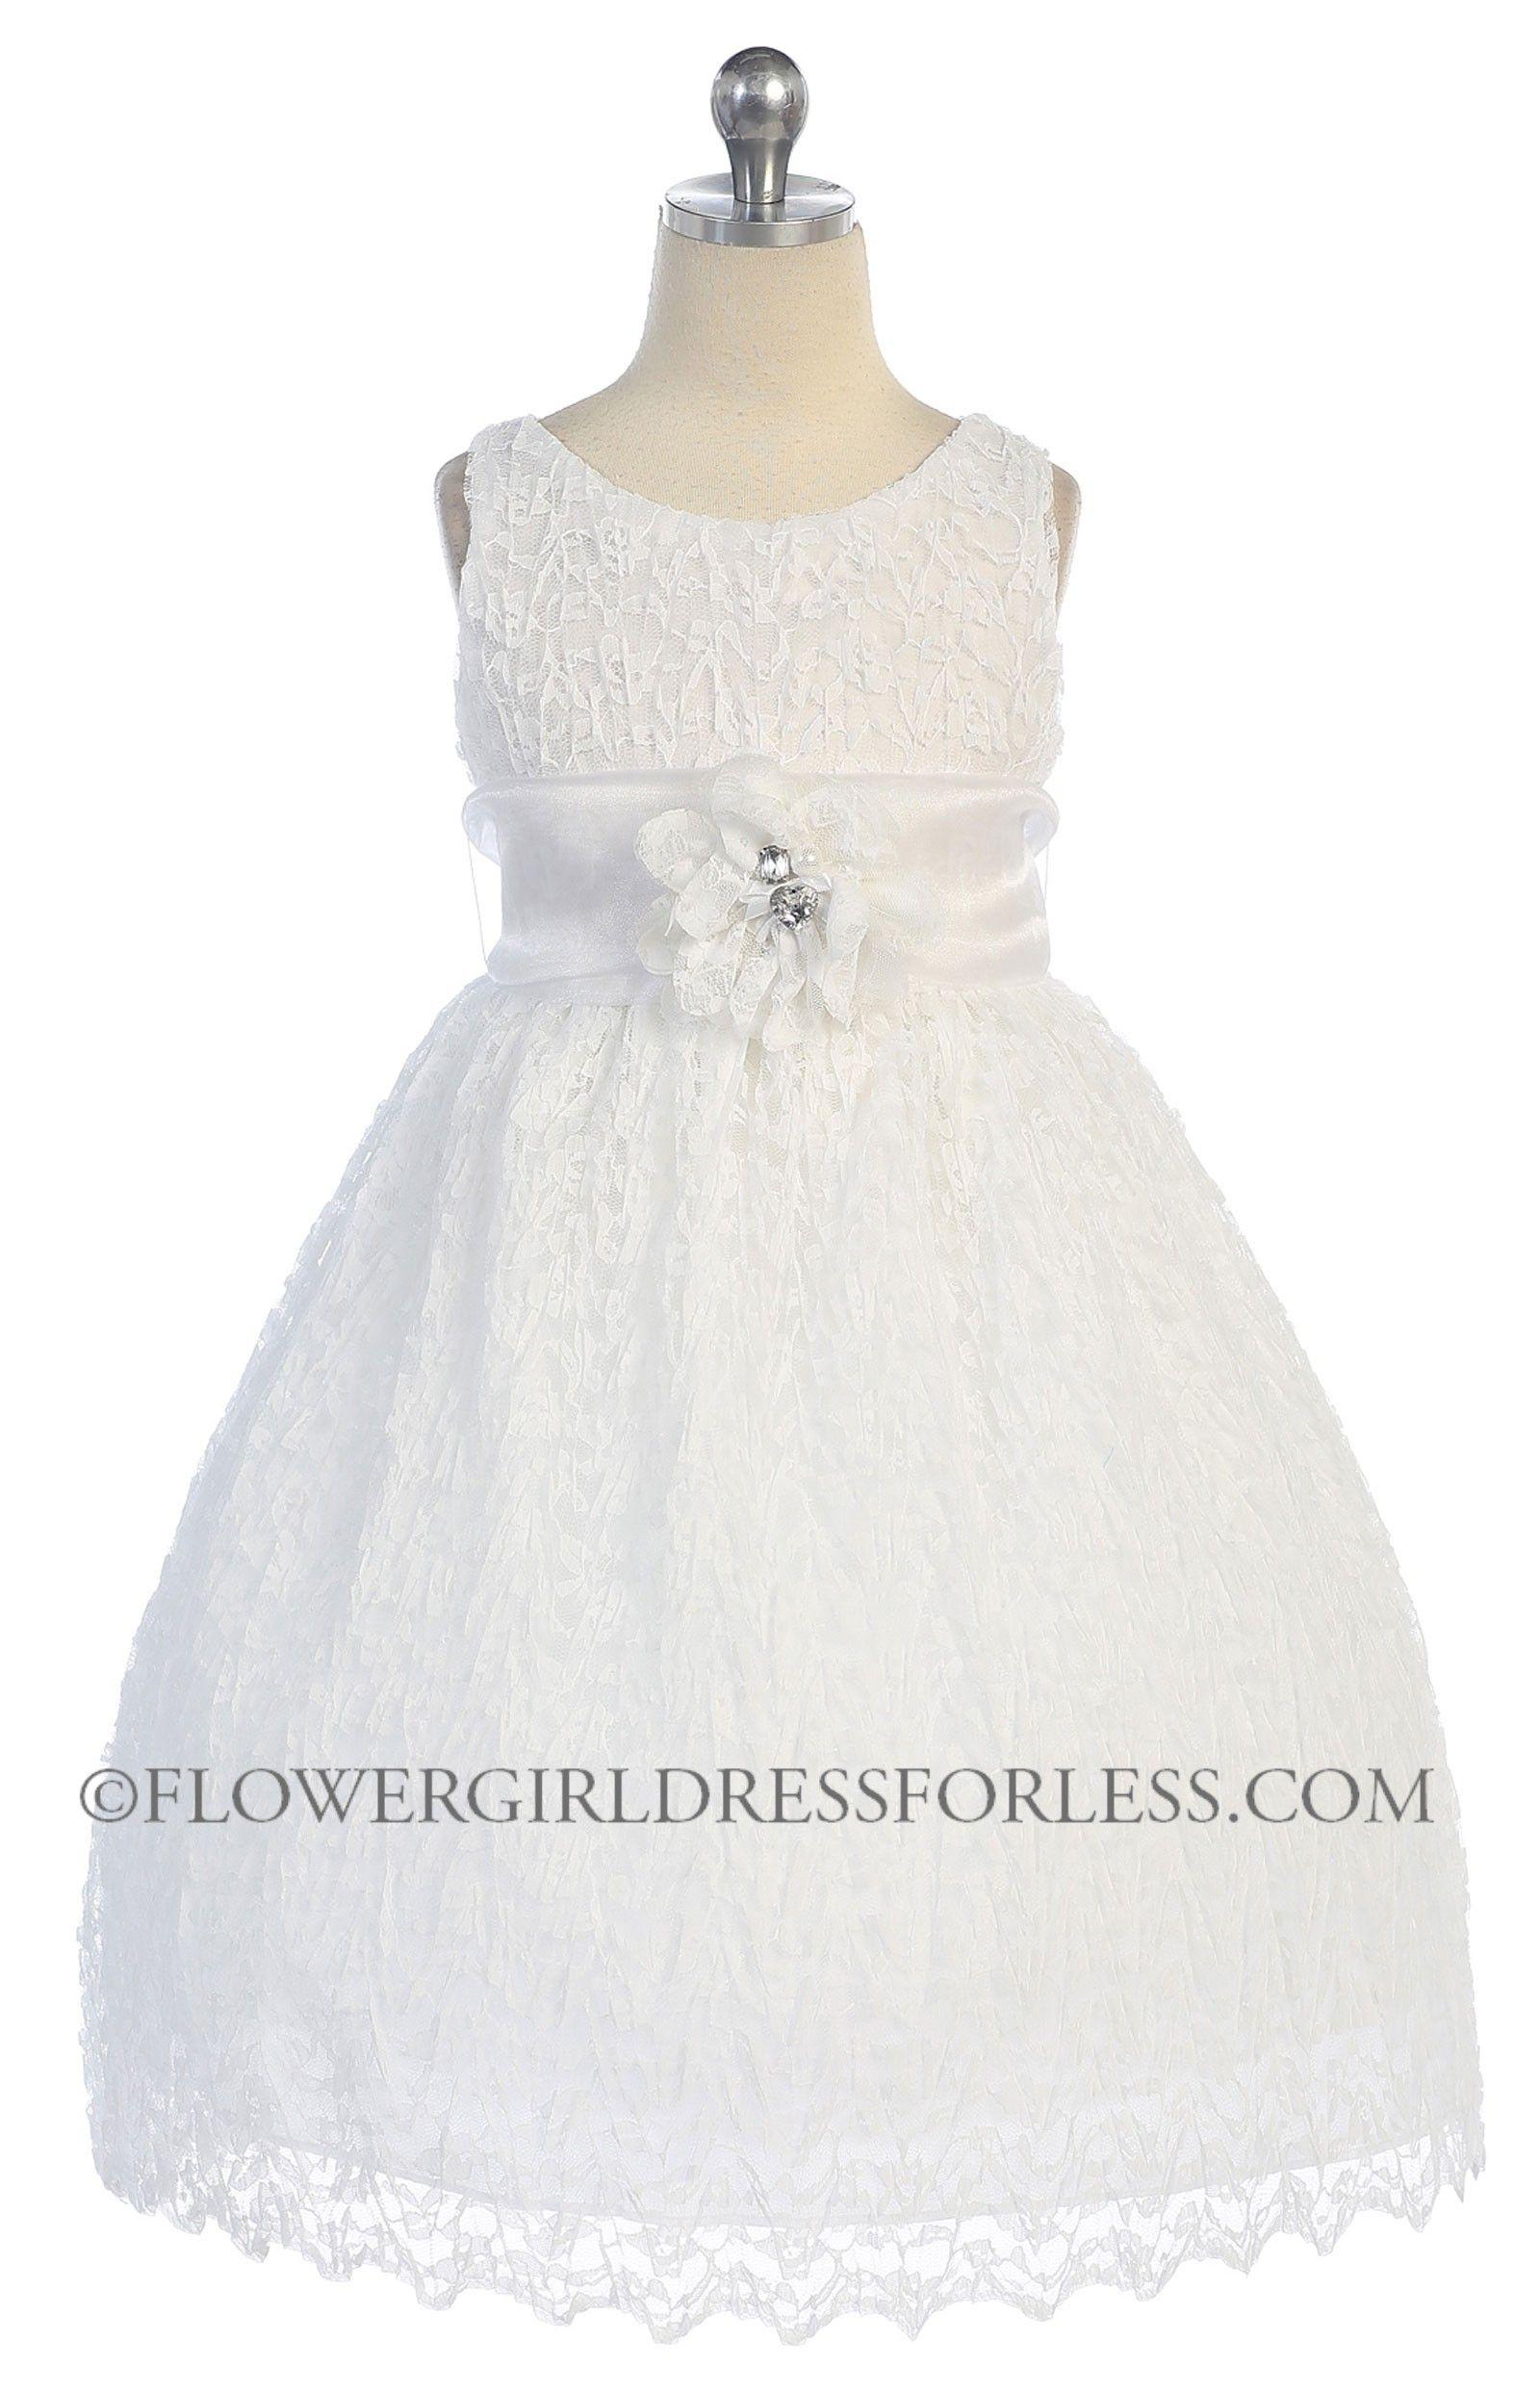 Cab730w Girls Dress Style 730 White Or Ivory Dress With 70 Sash